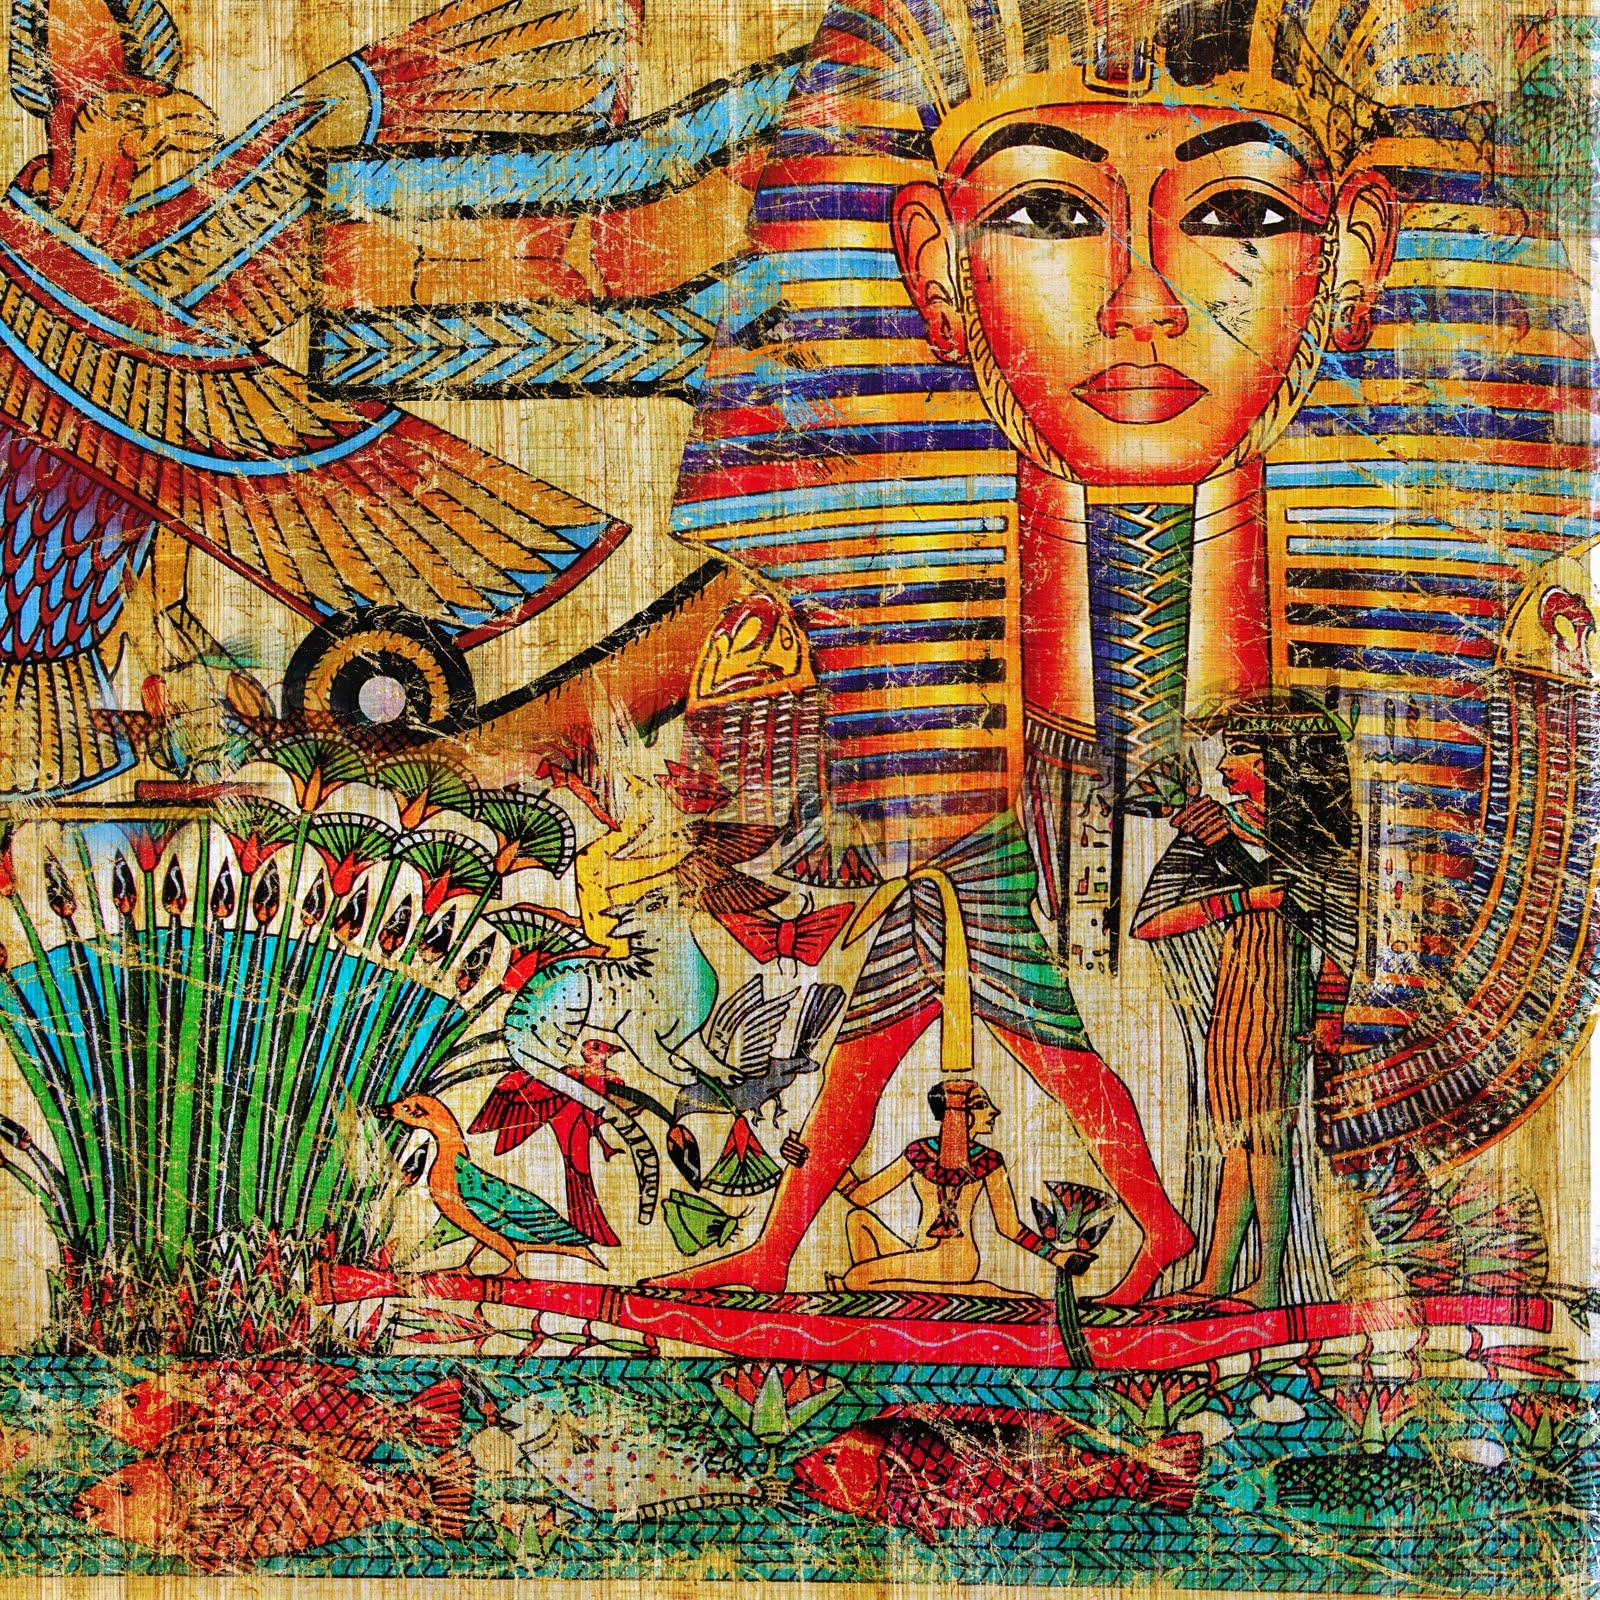 Banco de im genes para ver disfrutar y compartir for Ancient egyptian mural paintings